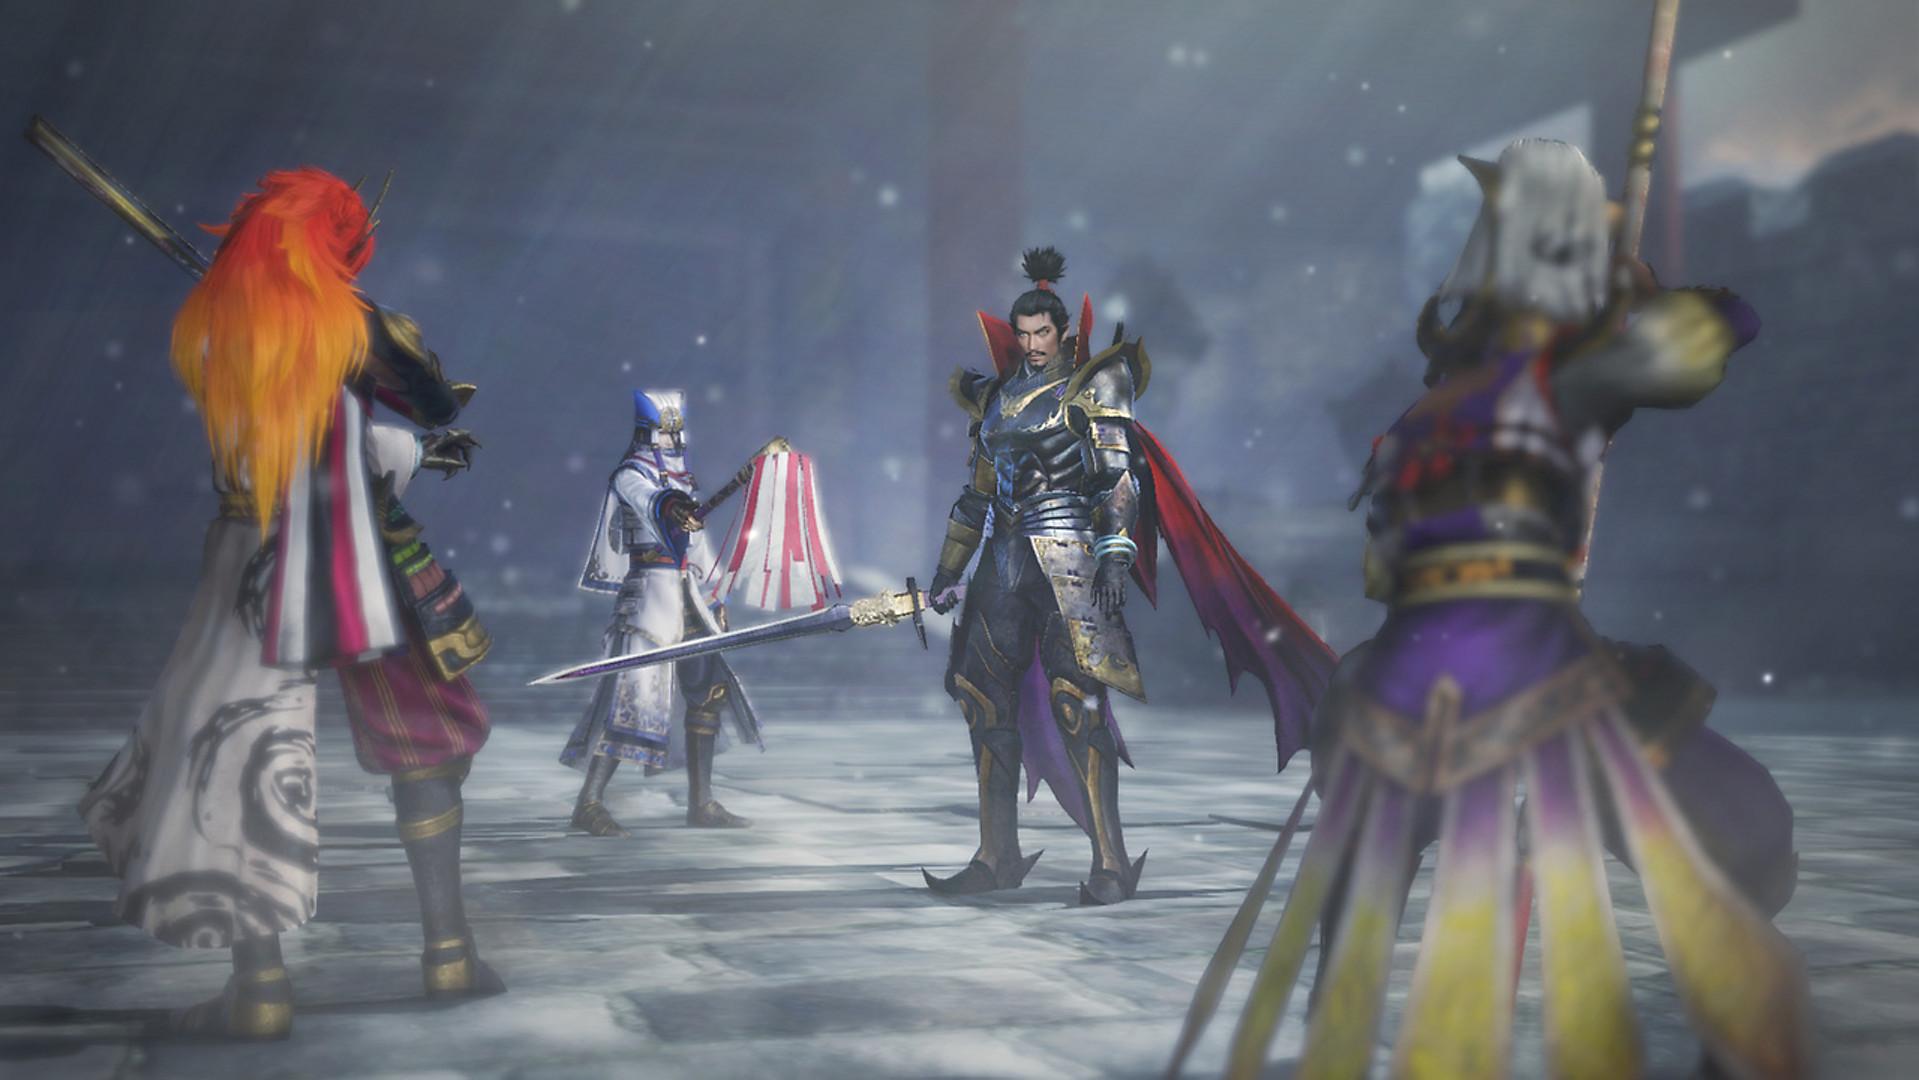 Koei Tecmo seems to be teasing Warriors Orochi 4: Ultimate screenshot